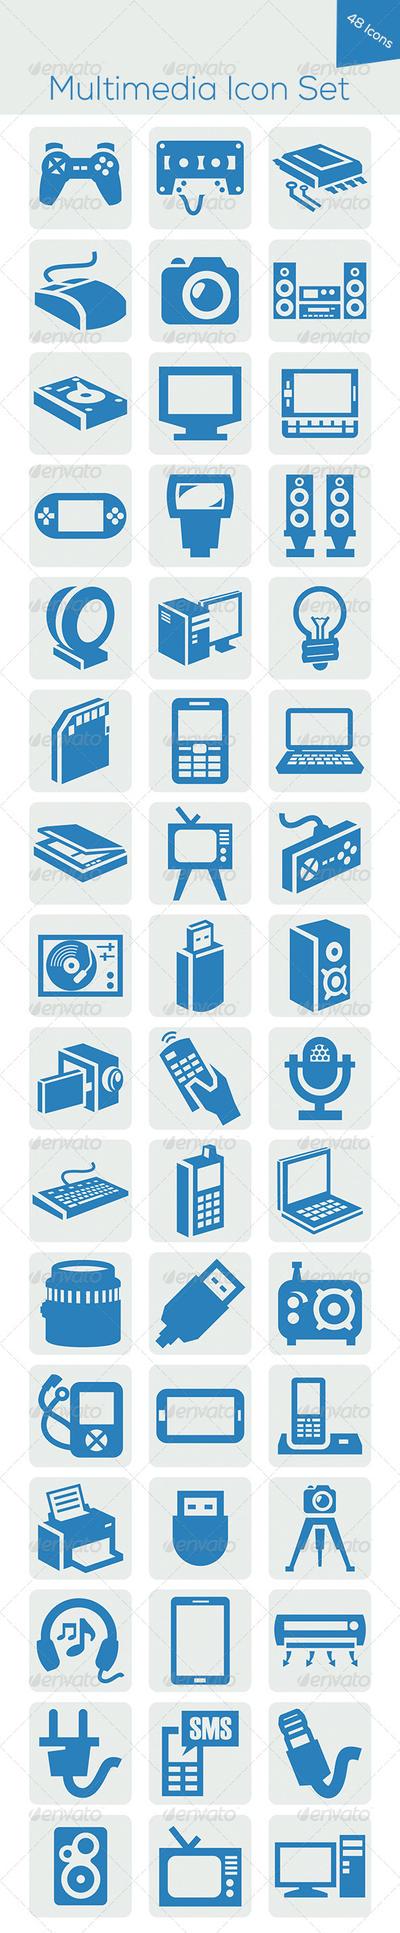 Multimedia Icon Set by hanifharoon